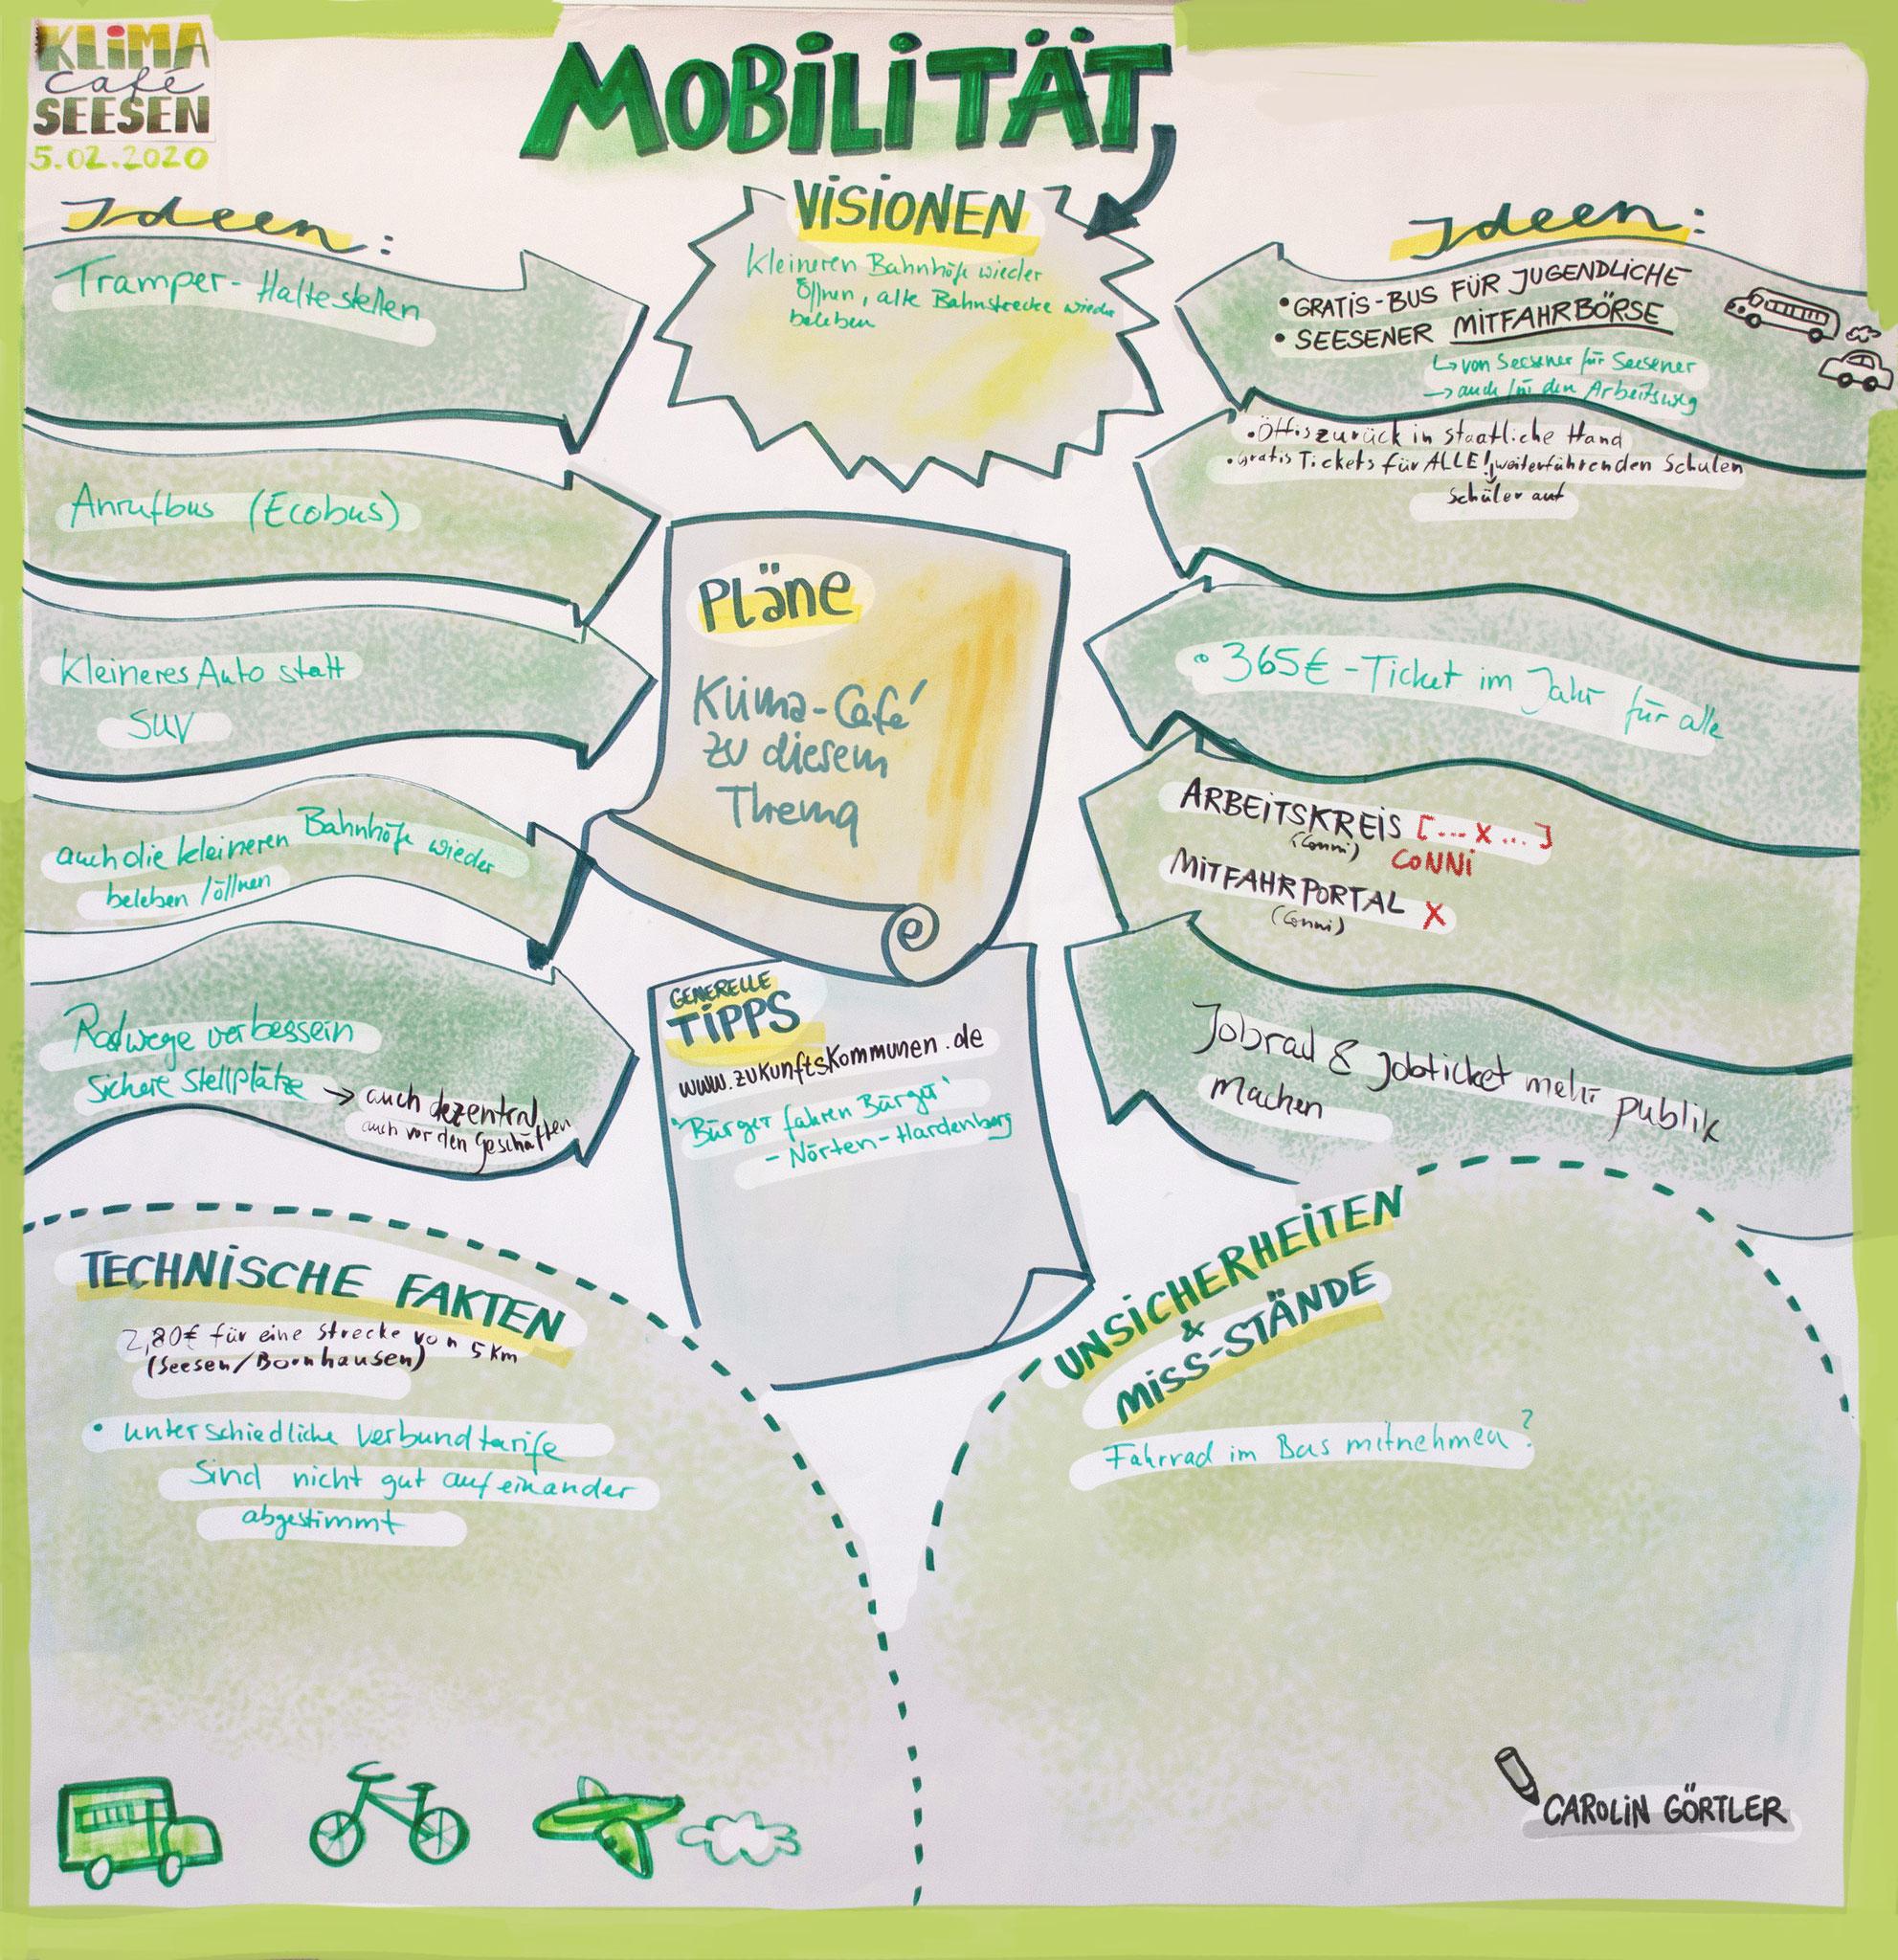 Graphic Facilitation Workshop Gruppenarbeit Mobilität